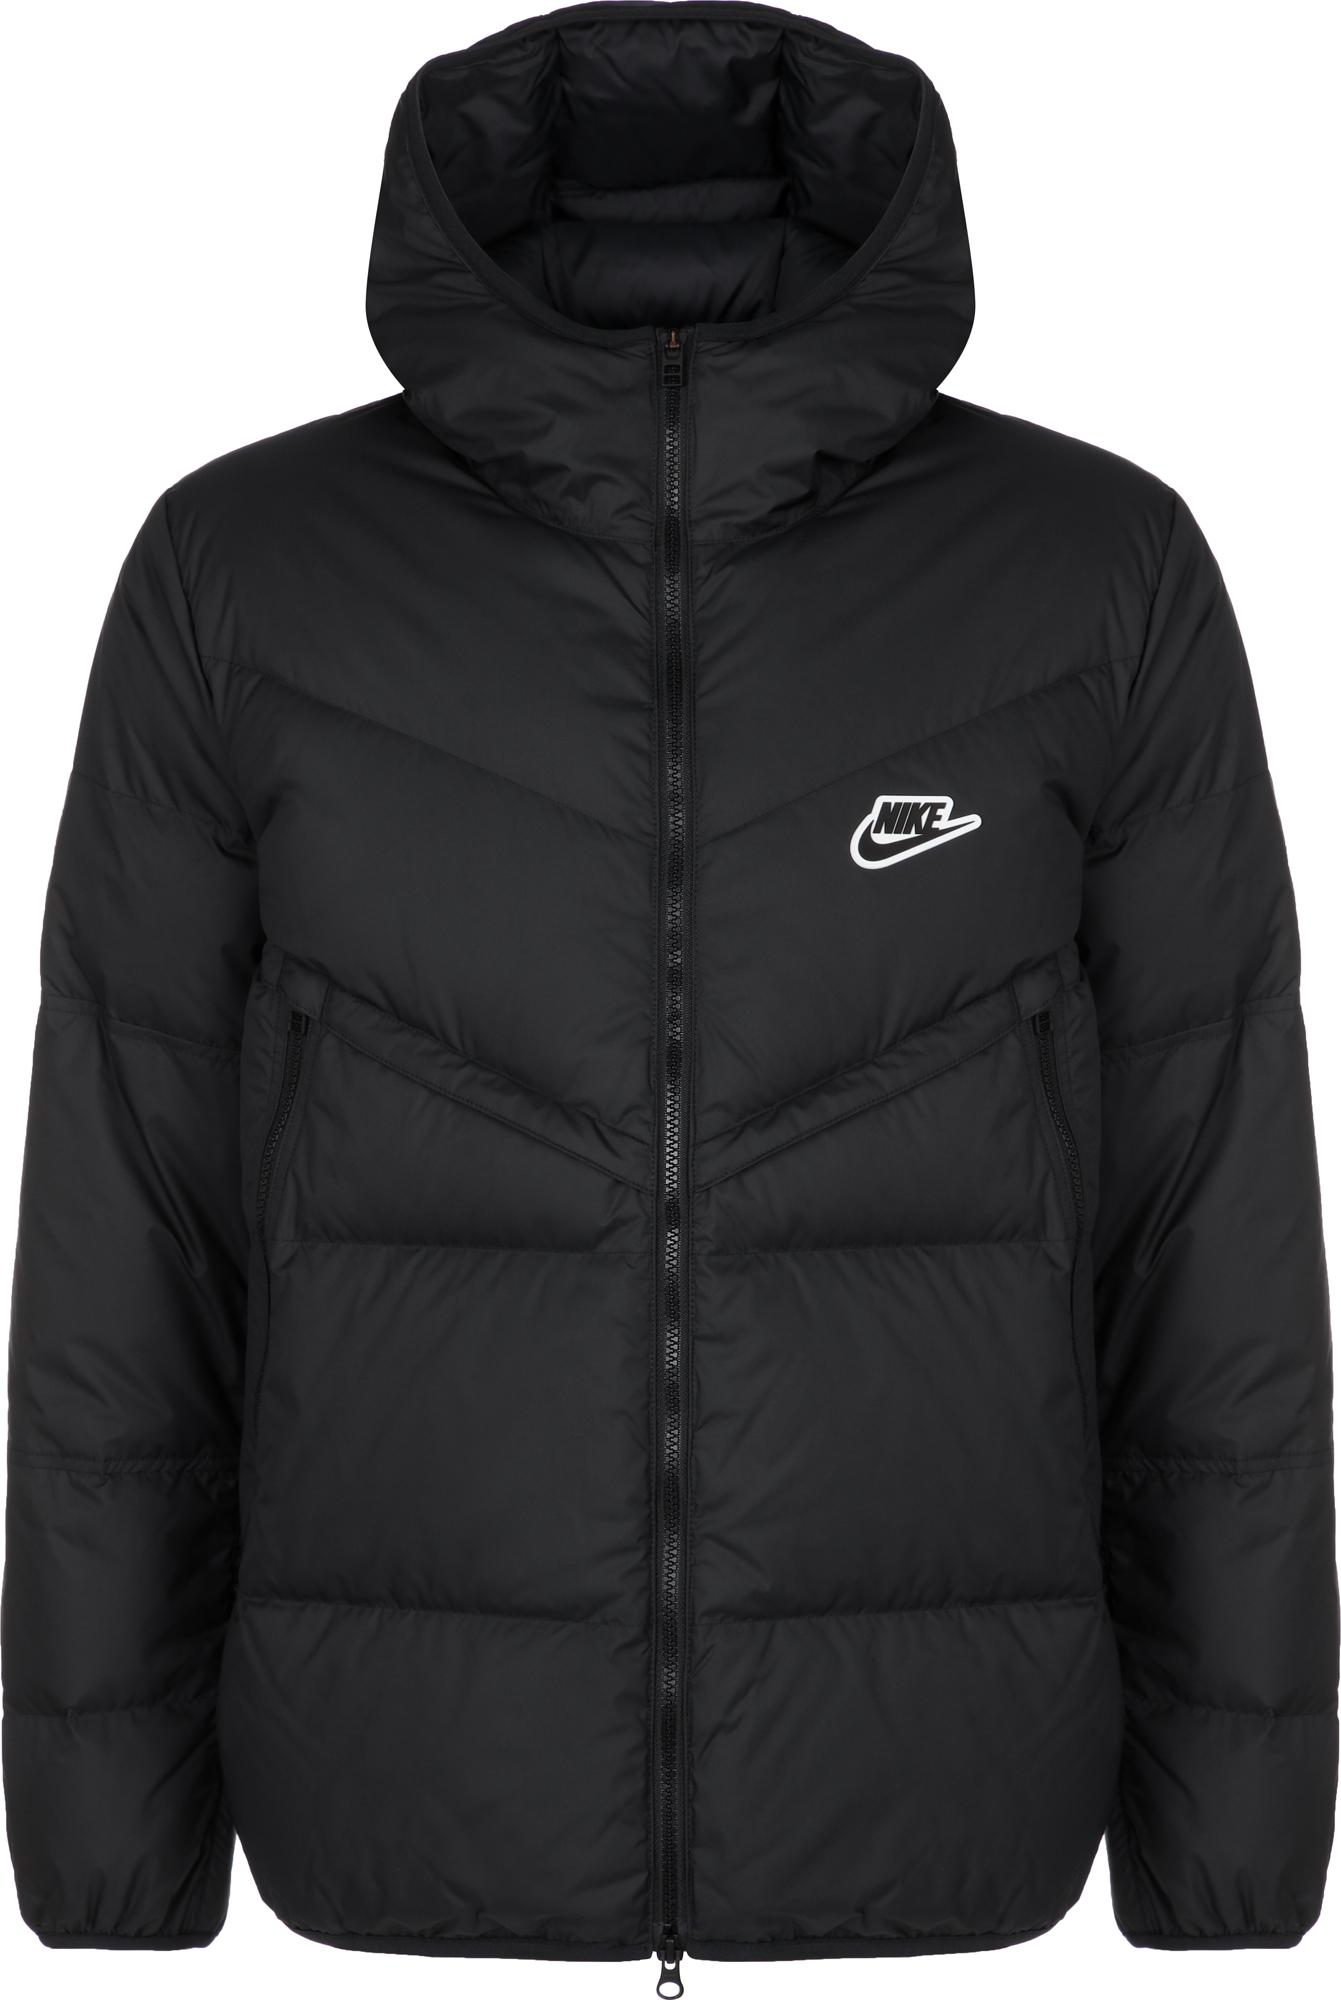 Nike Пуховик мужской Nike Sportswear Windrunner, размер 46-48